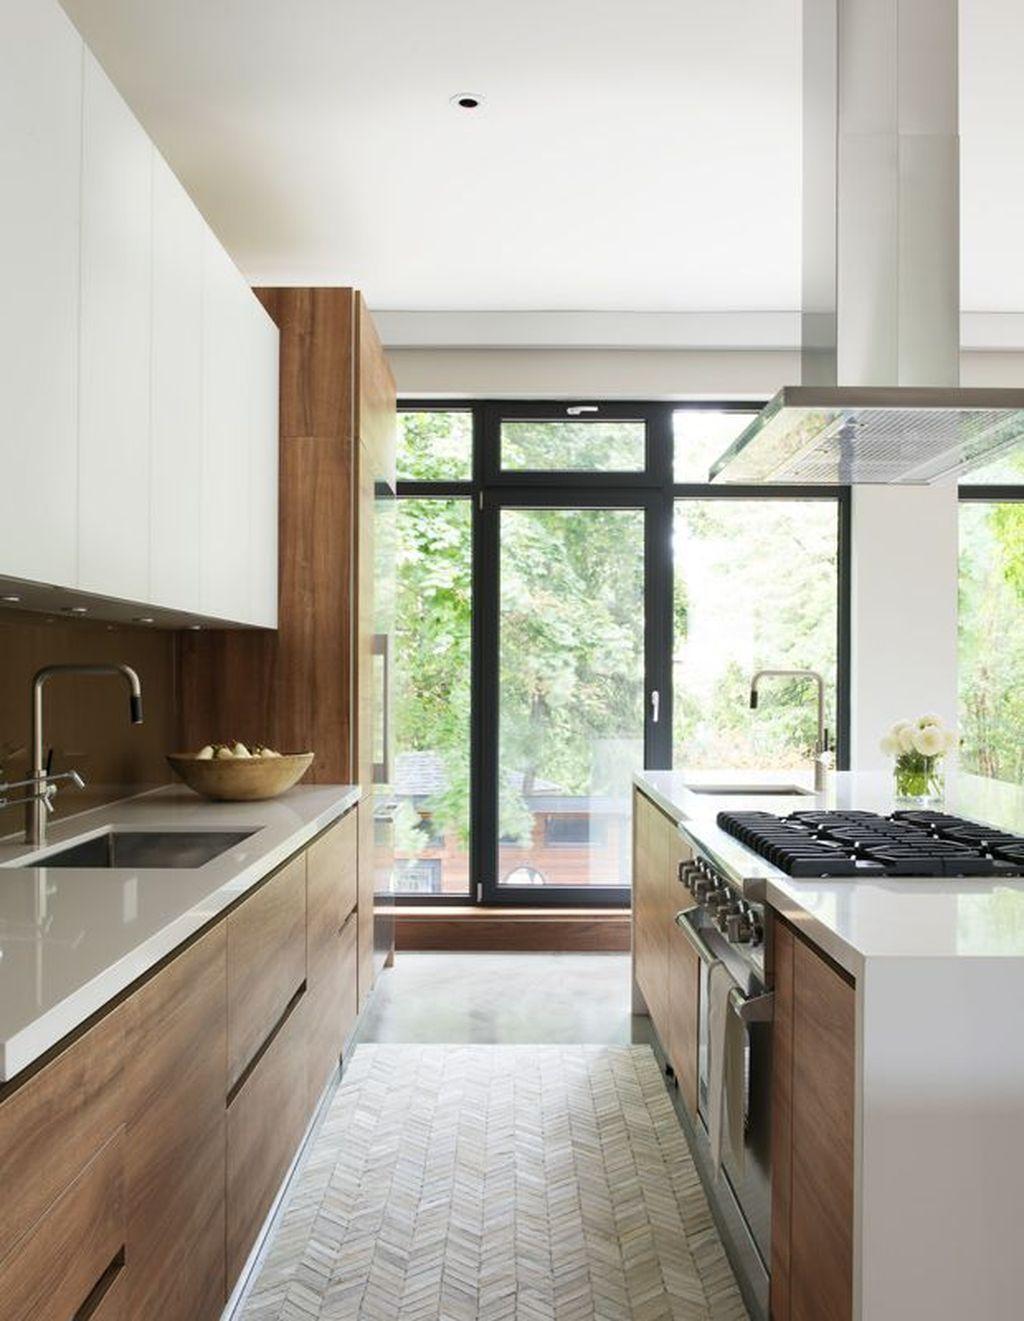 50 Gorgeous Modern Kitchen Design Ideas Kuchendesign Kuchen Design Ideen Moderne Kuche